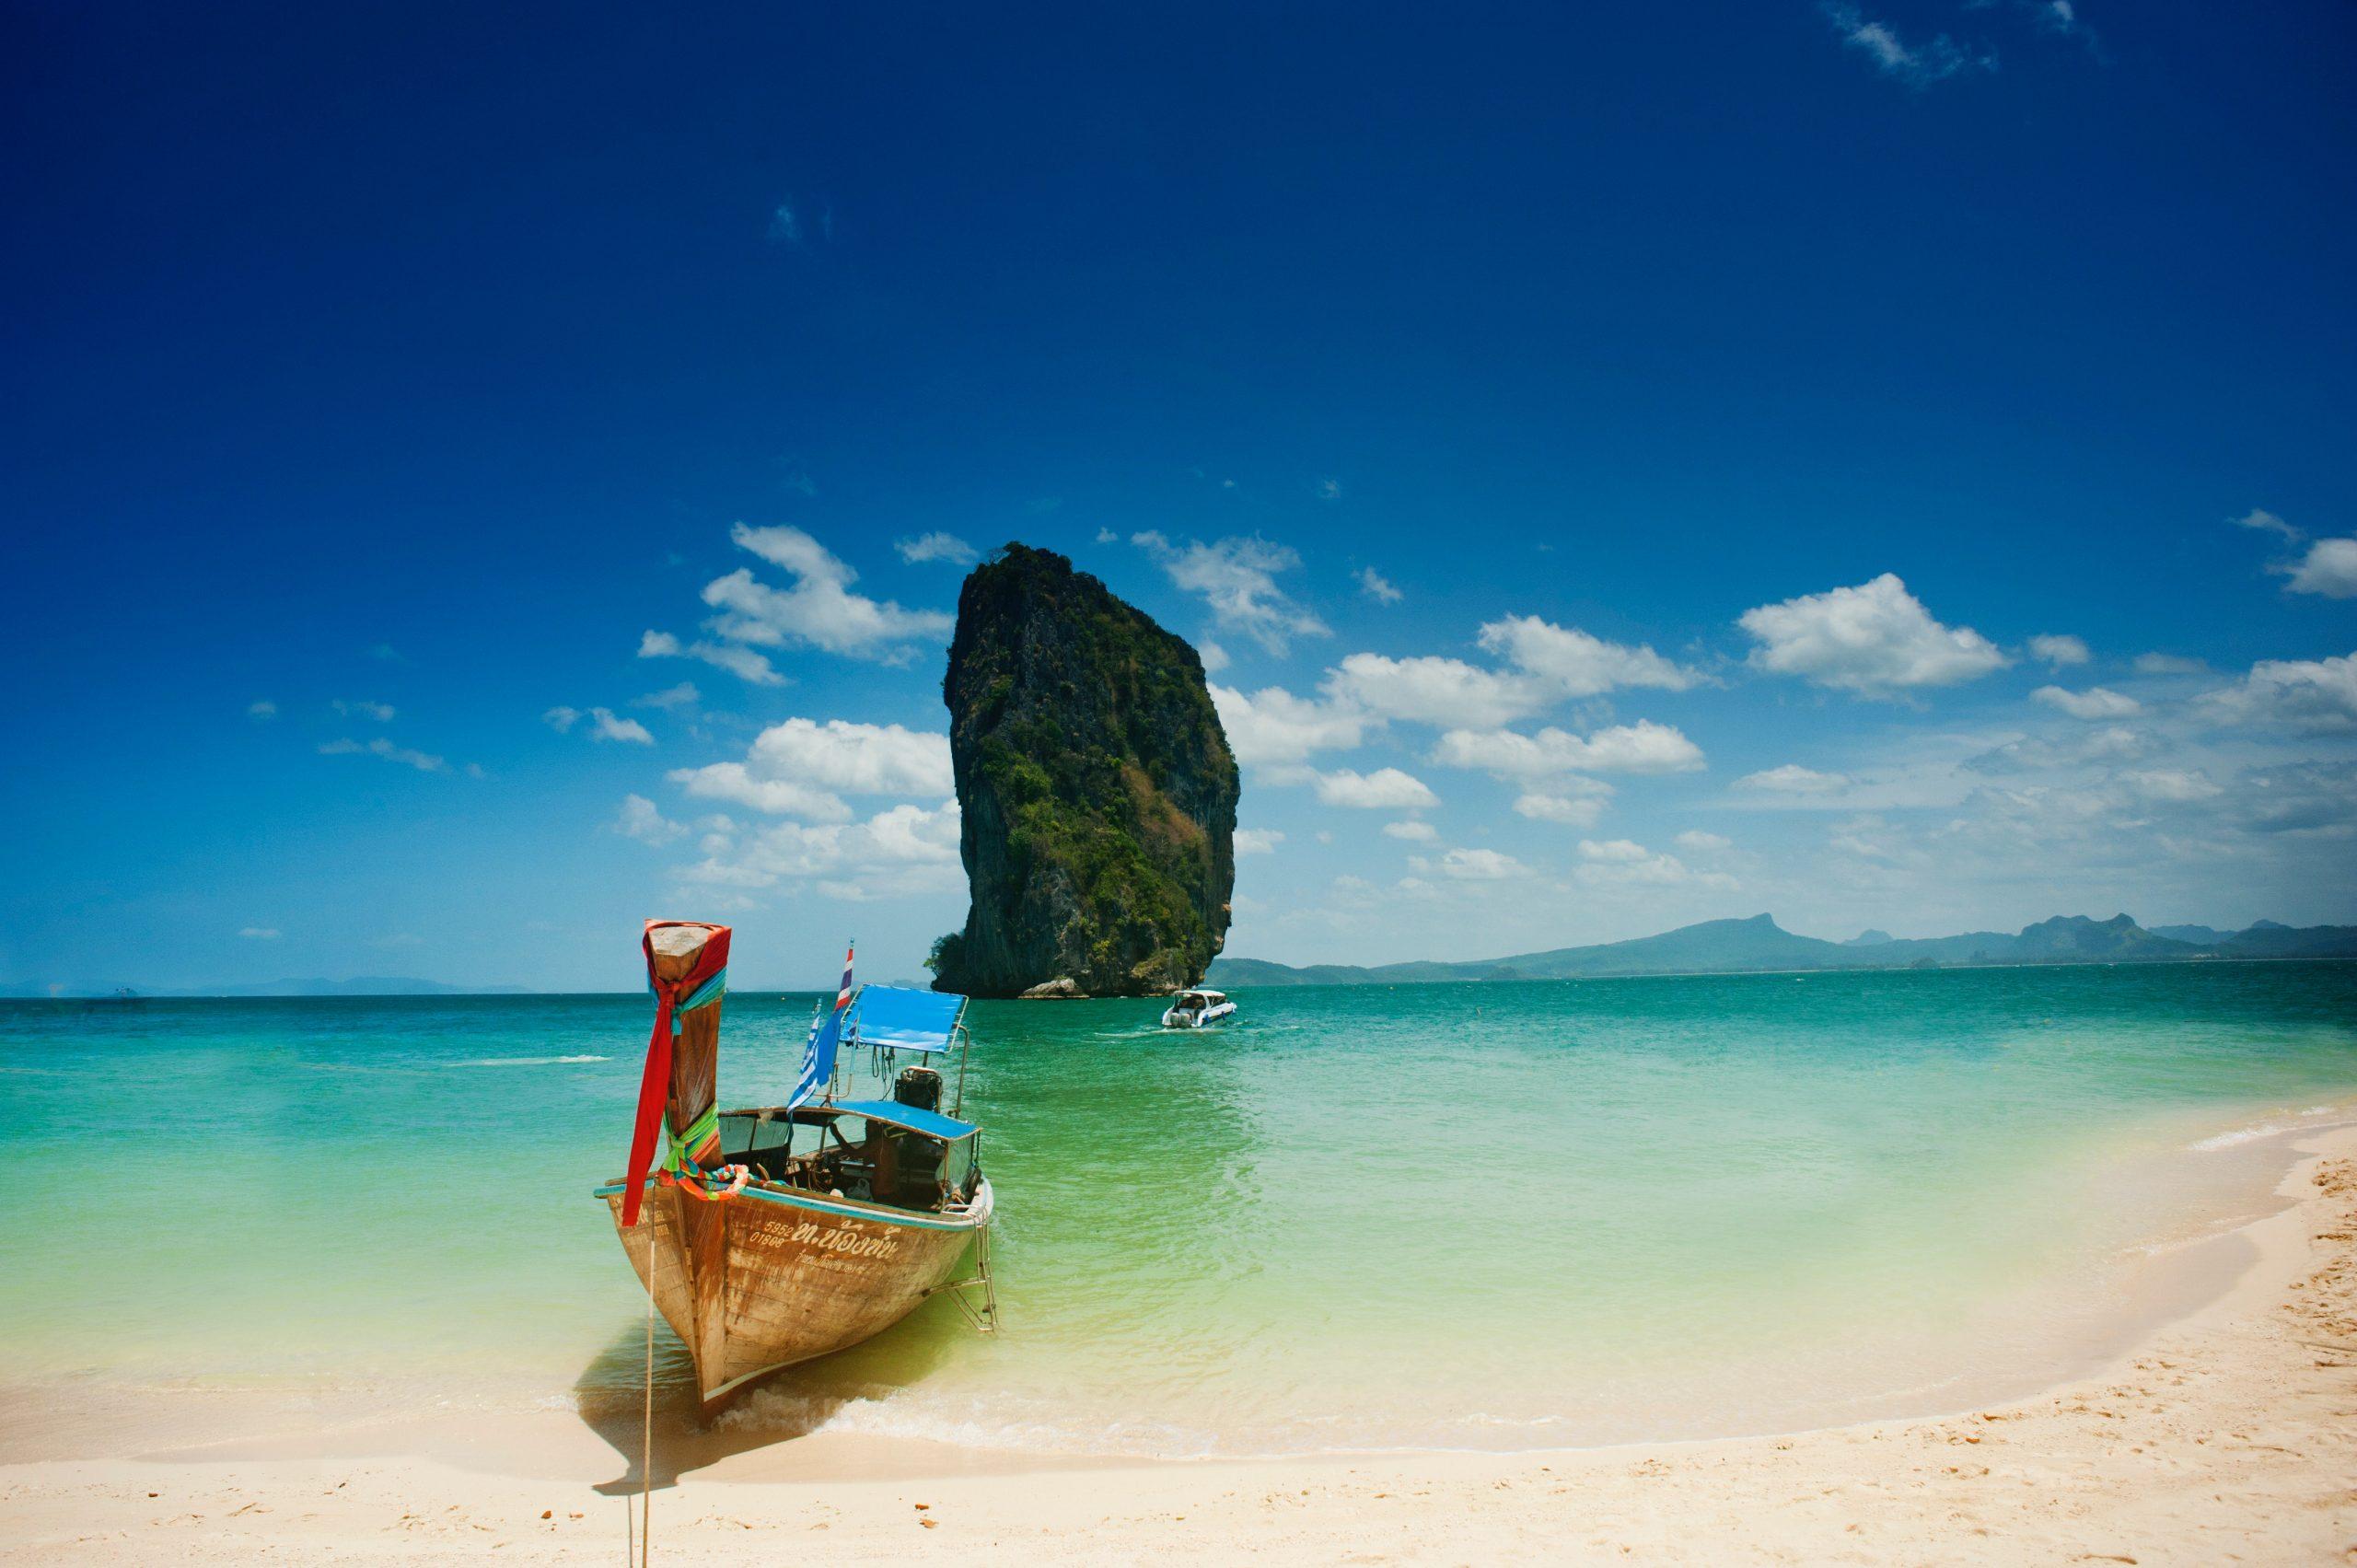 vakantie paradijs